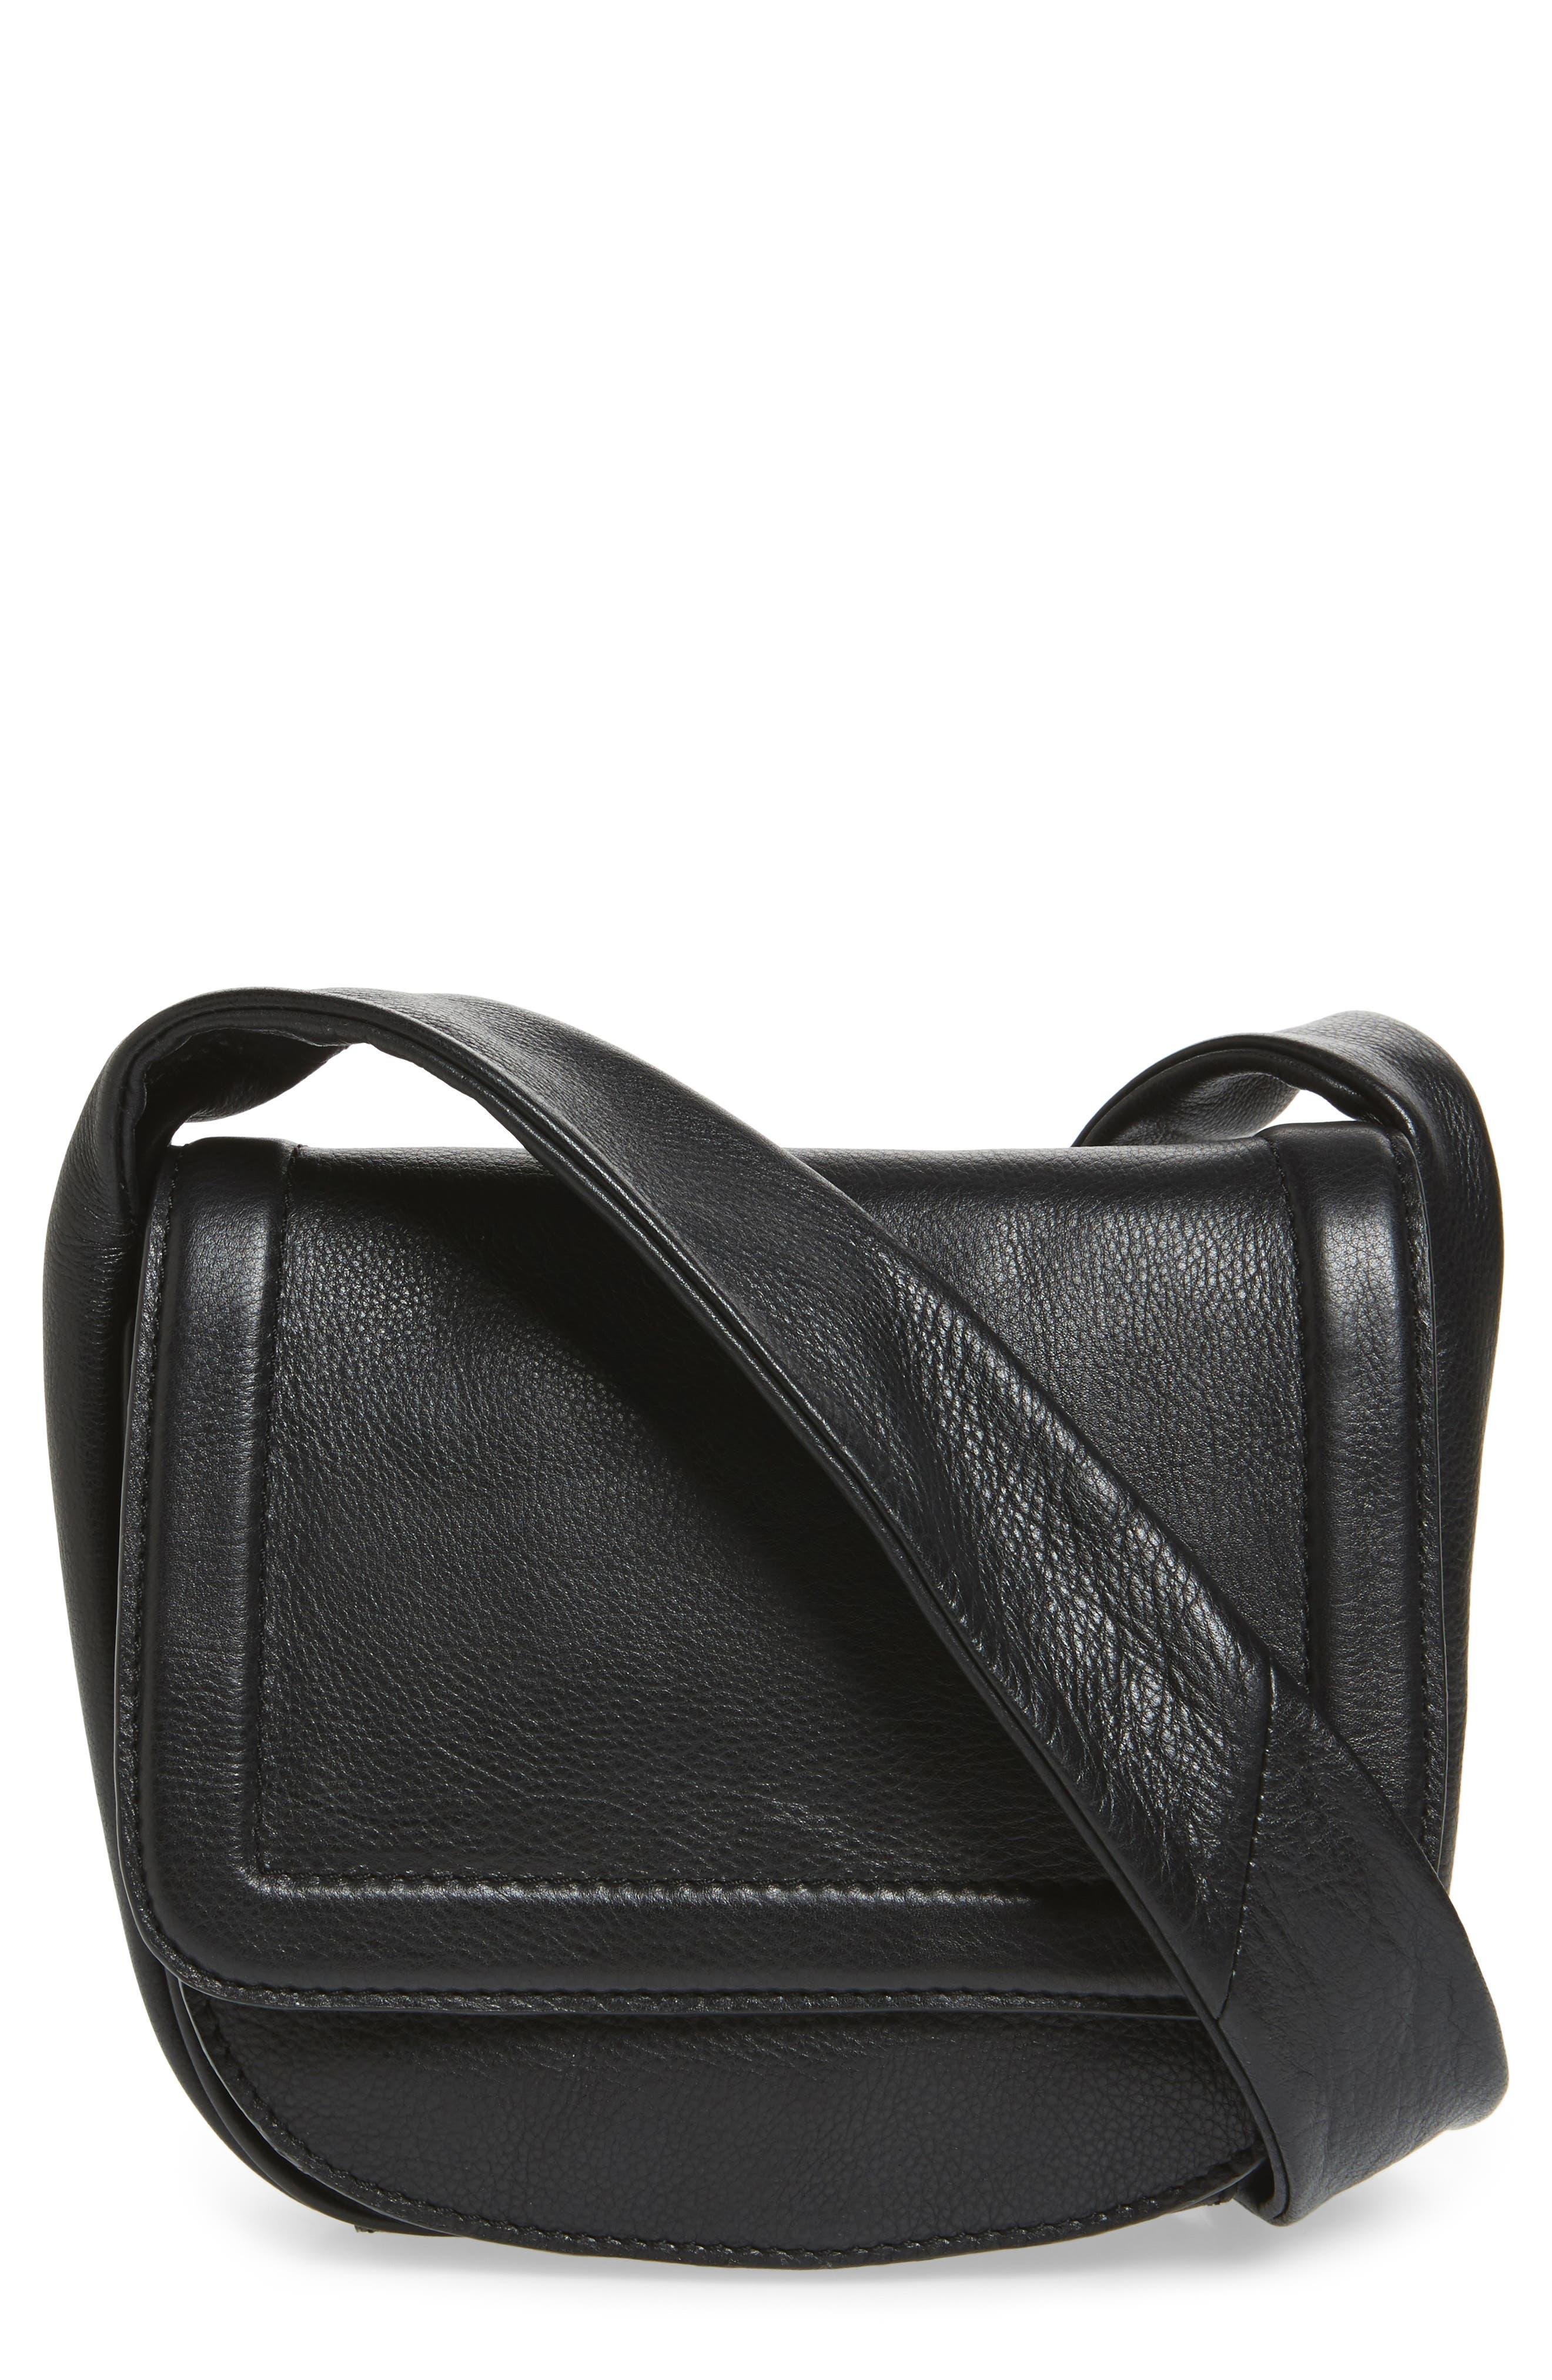 Jasmine Leather Saddle Bag,                             Main thumbnail 1, color,                             Black